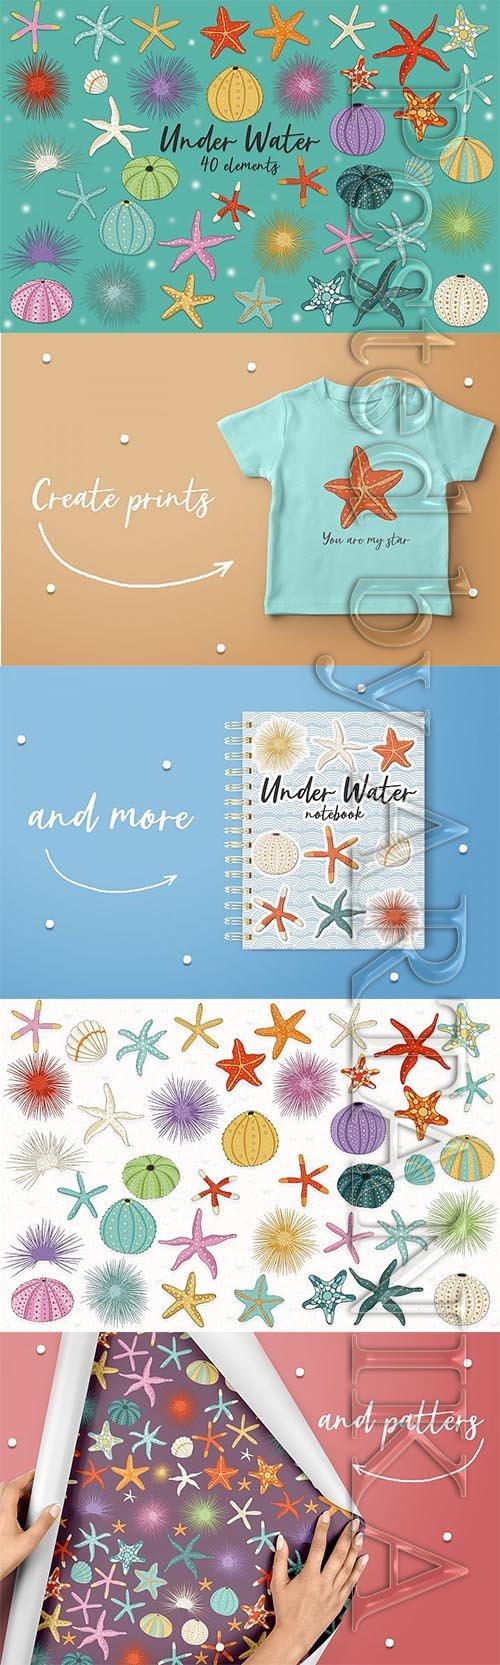 Designbundles - Under Water designs for prints and patterns